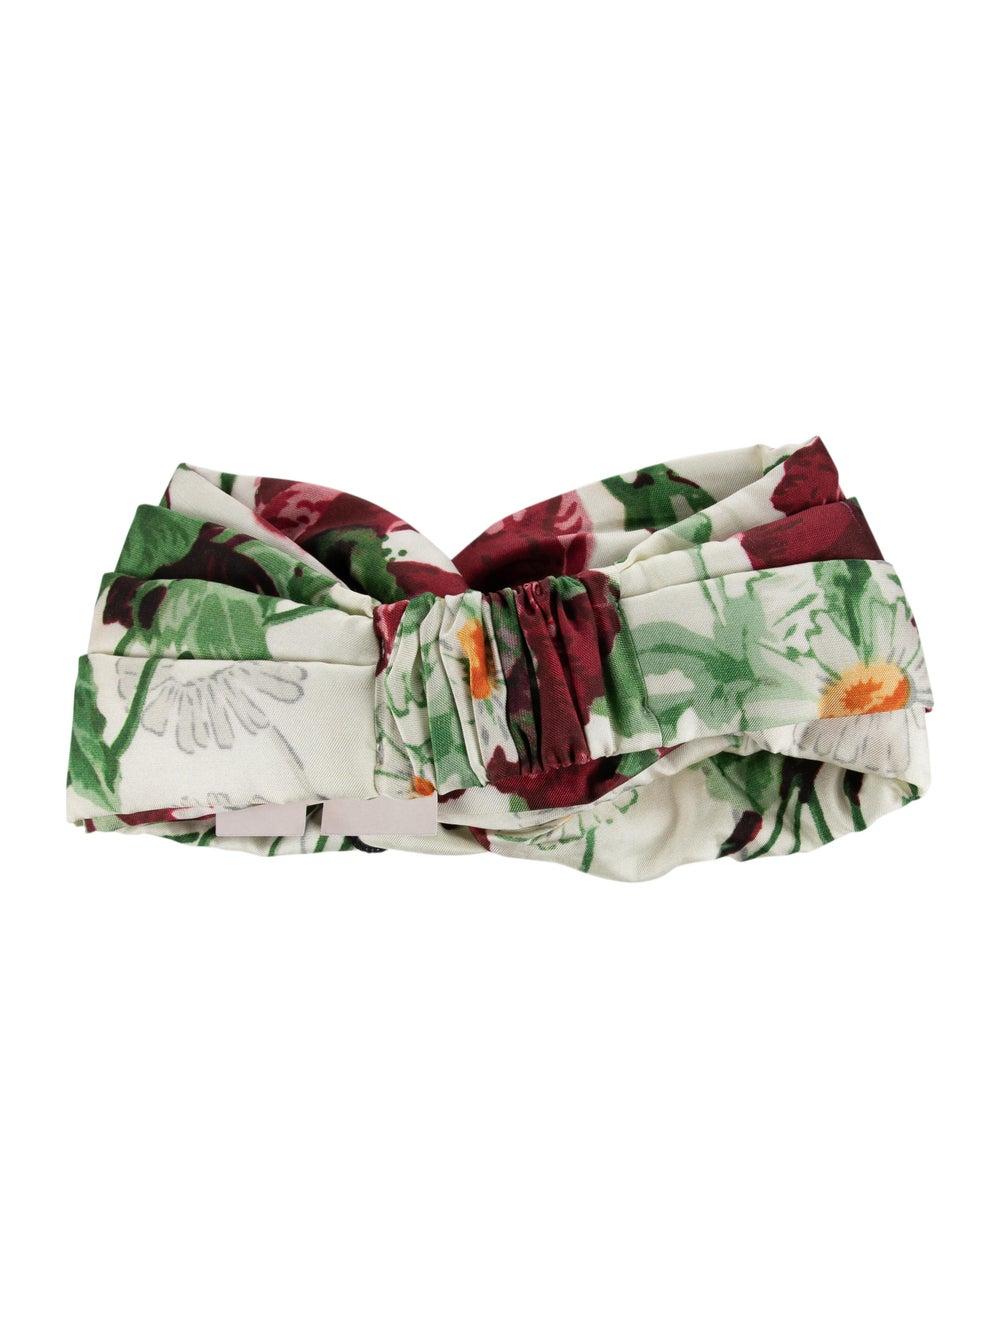 Gucci Silk Floral Headband w/ Tags multicolor - image 2